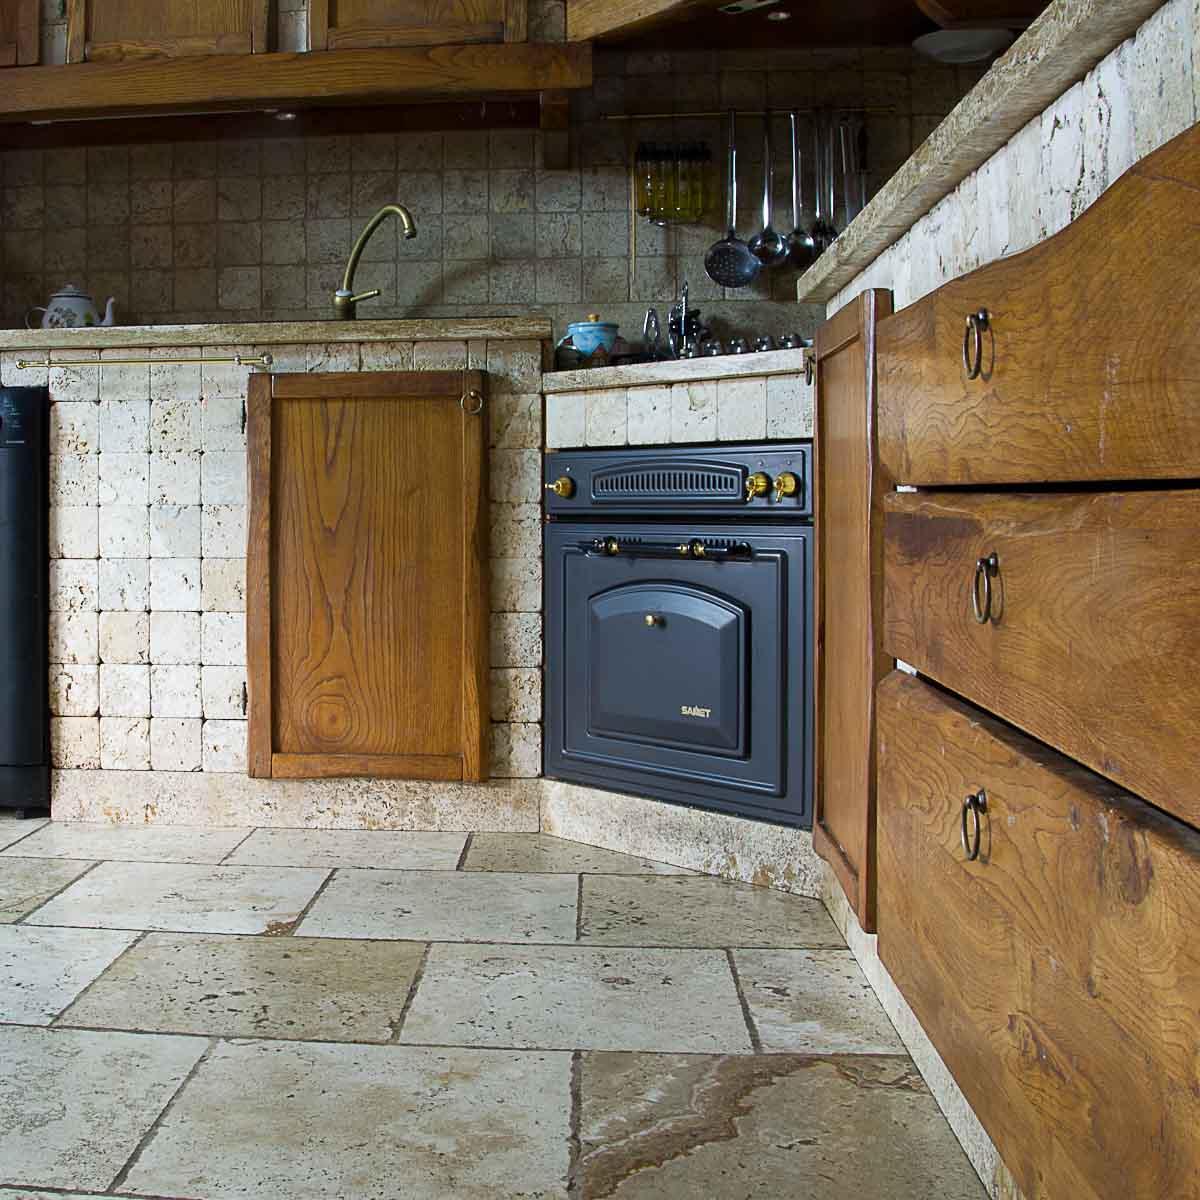 Cucina in muratura rivestita in travertino pietre di rapolano - Cucine muratura rustiche in pietra ...